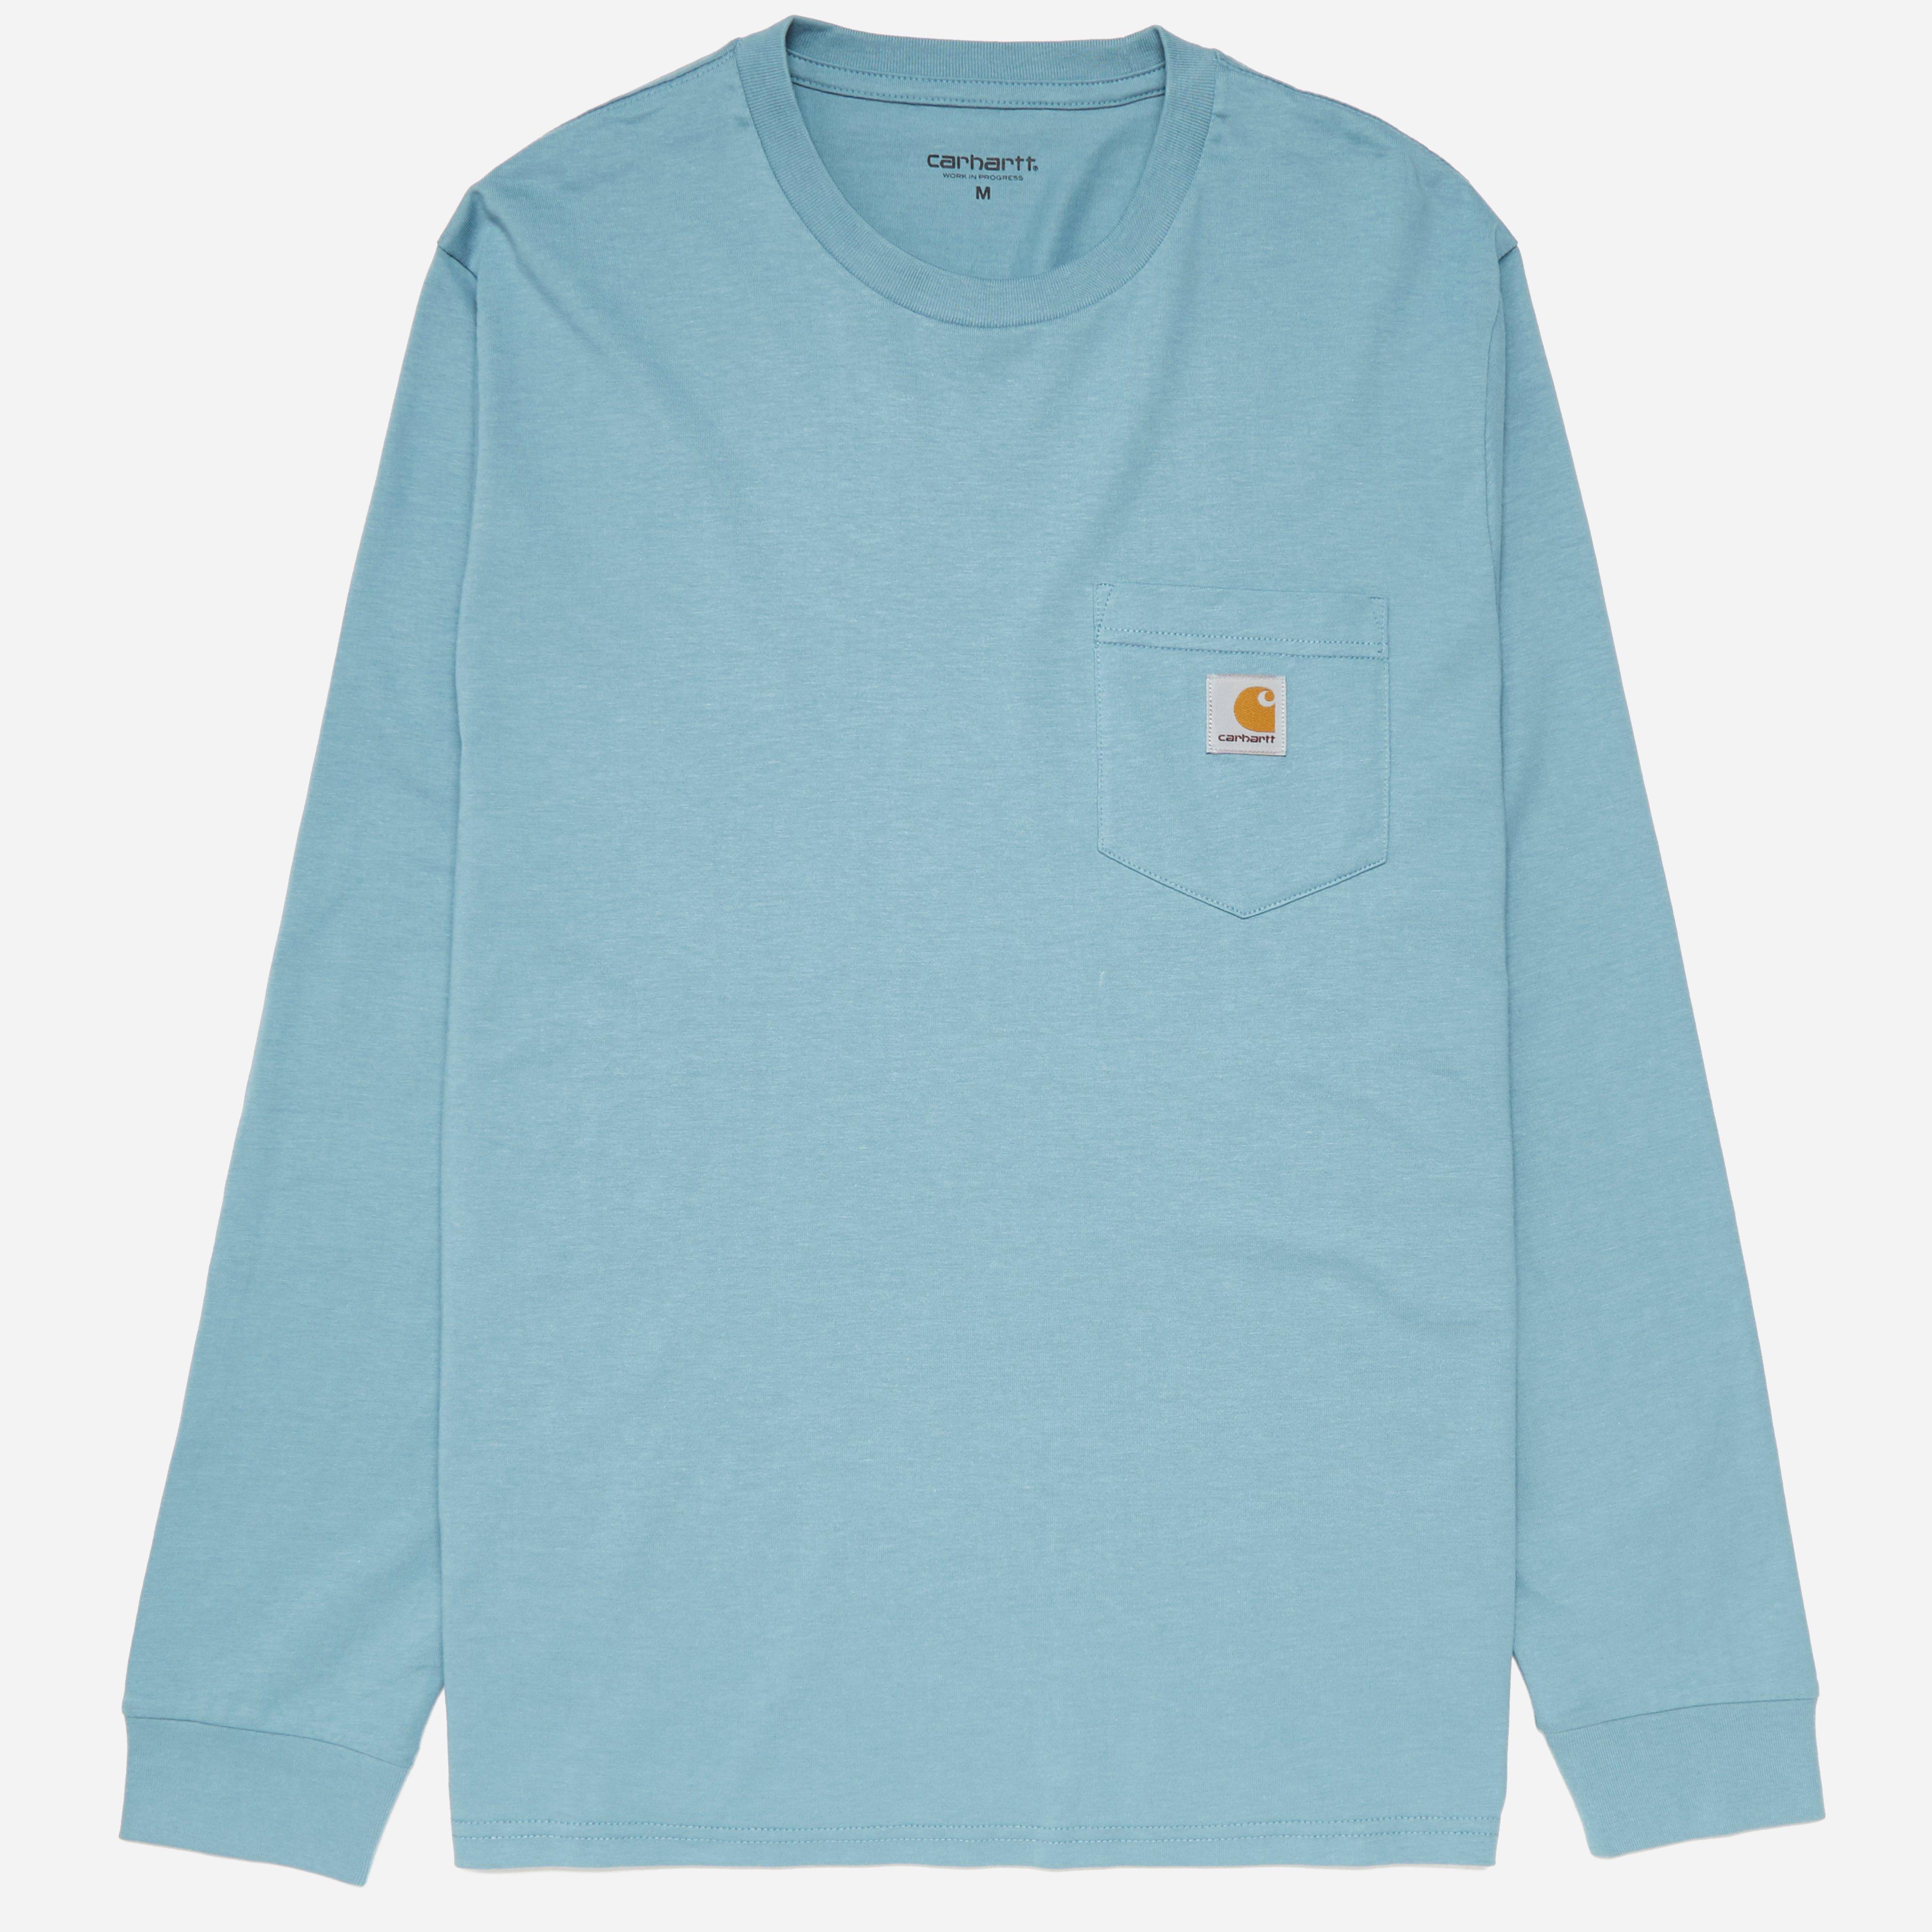 Carhartt WIP Long Sleeved Single Jersey Pocket T-shirt